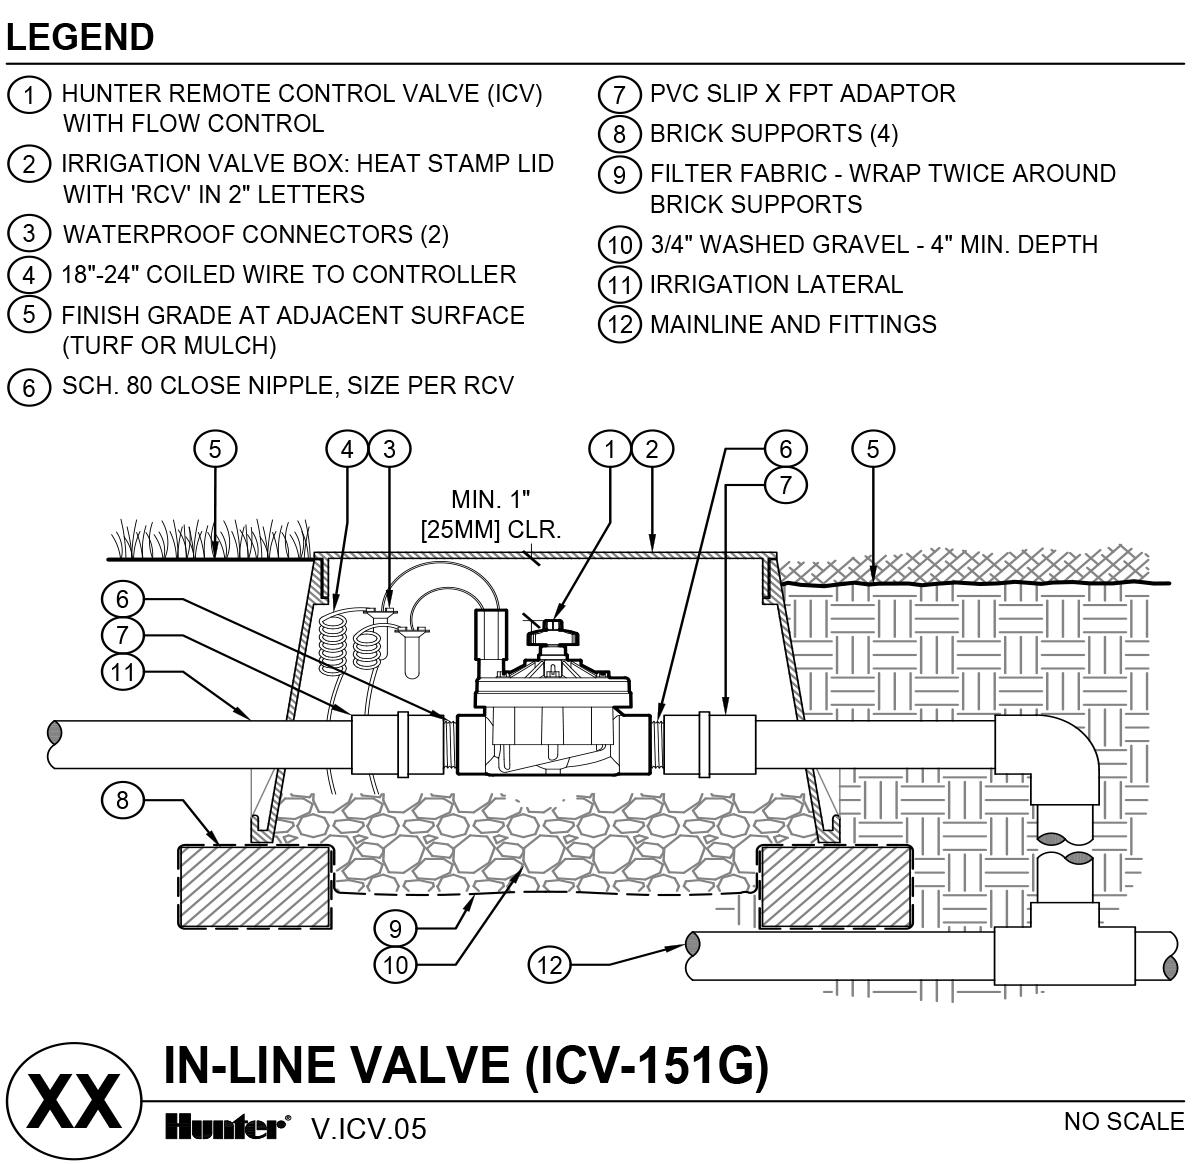 CAD - ICV-151G